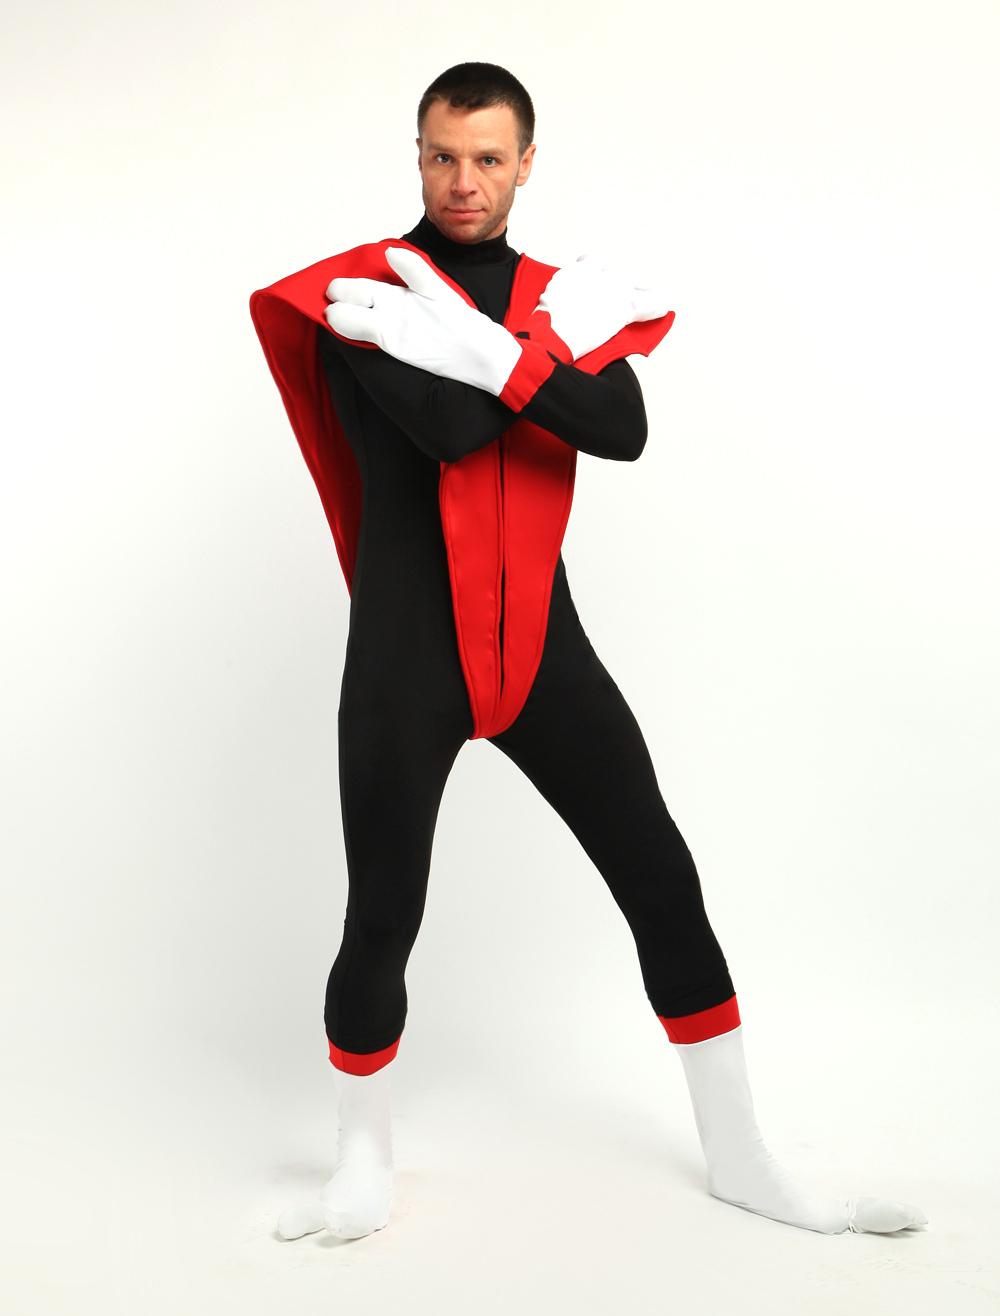 Black stockings tease